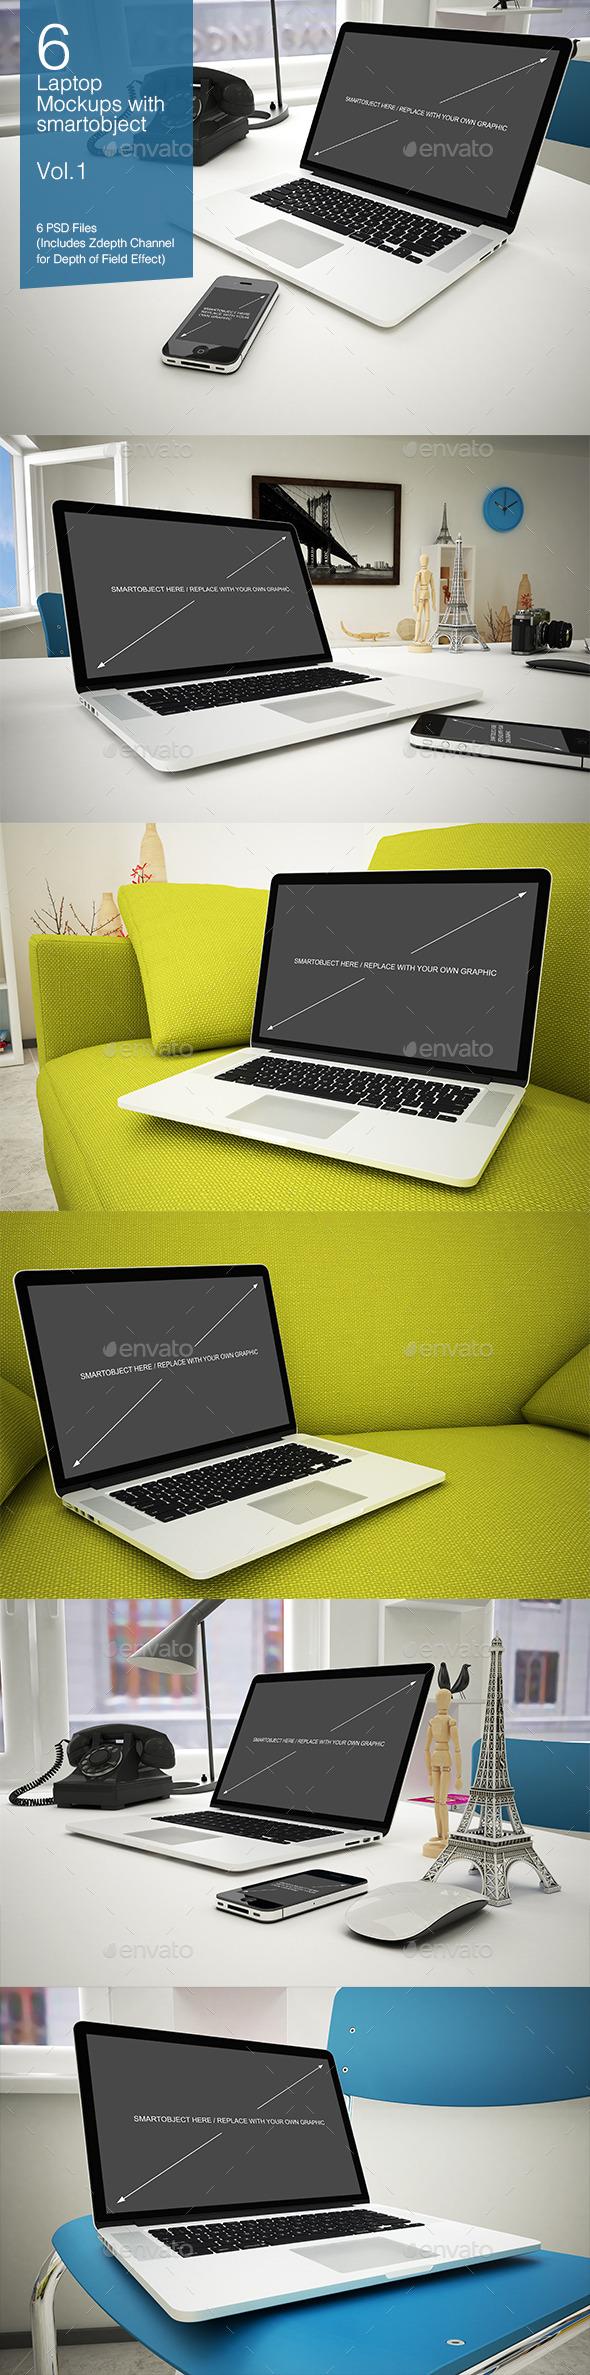 Laptop Mockup 6 Poses - Vol.1 - Laptop Displays